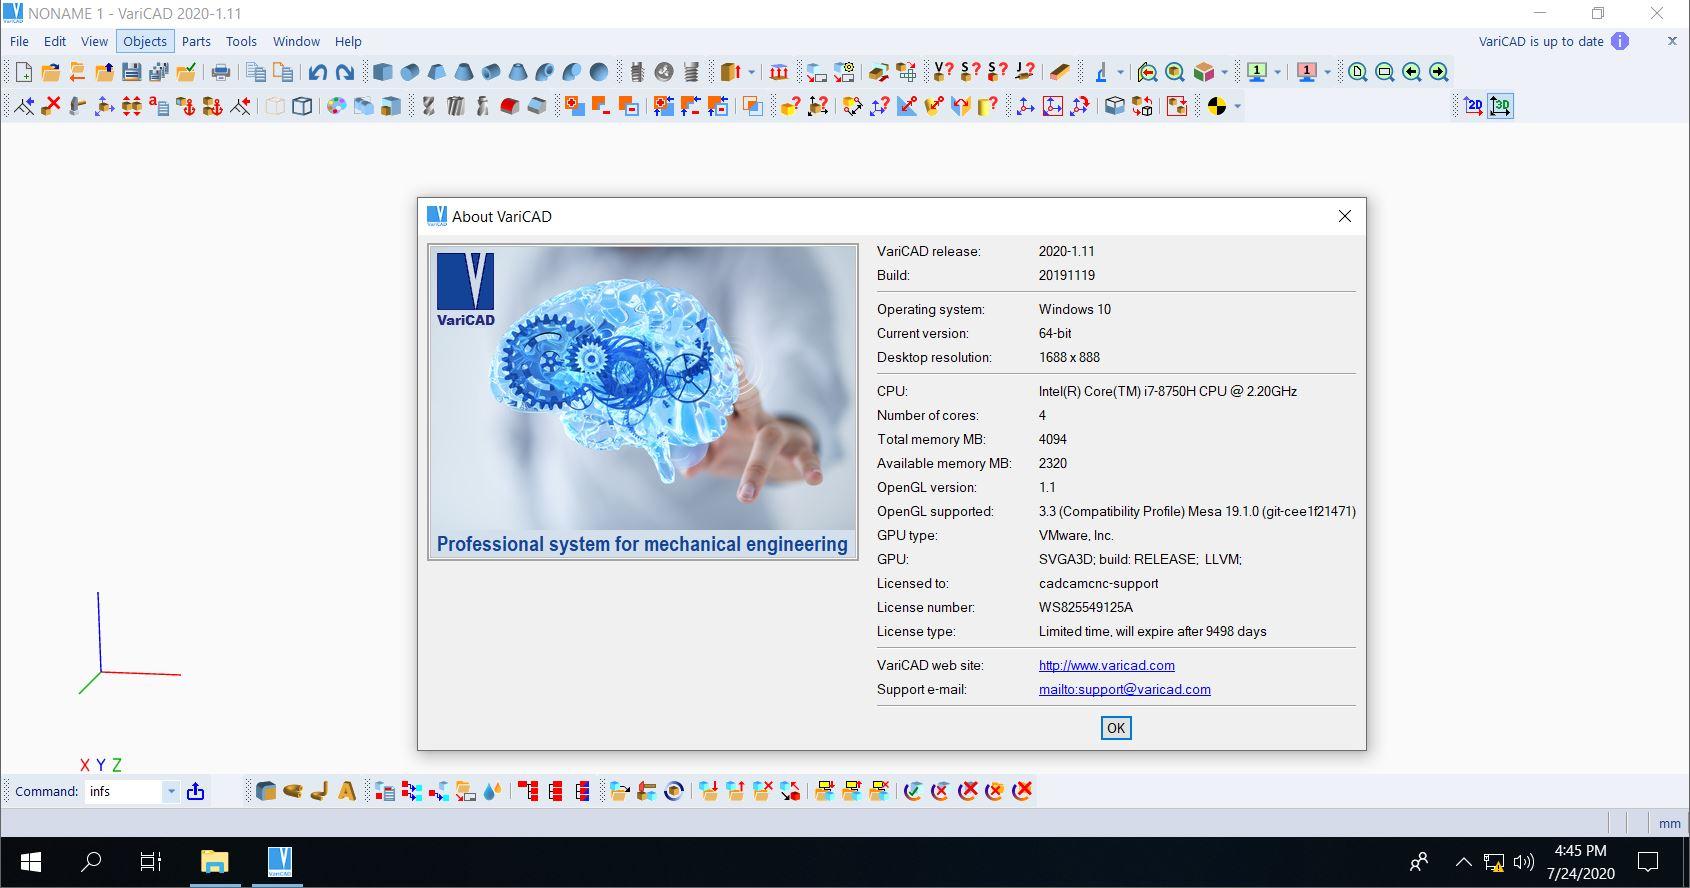 Working with VariCAD 2020 v1.11 full license